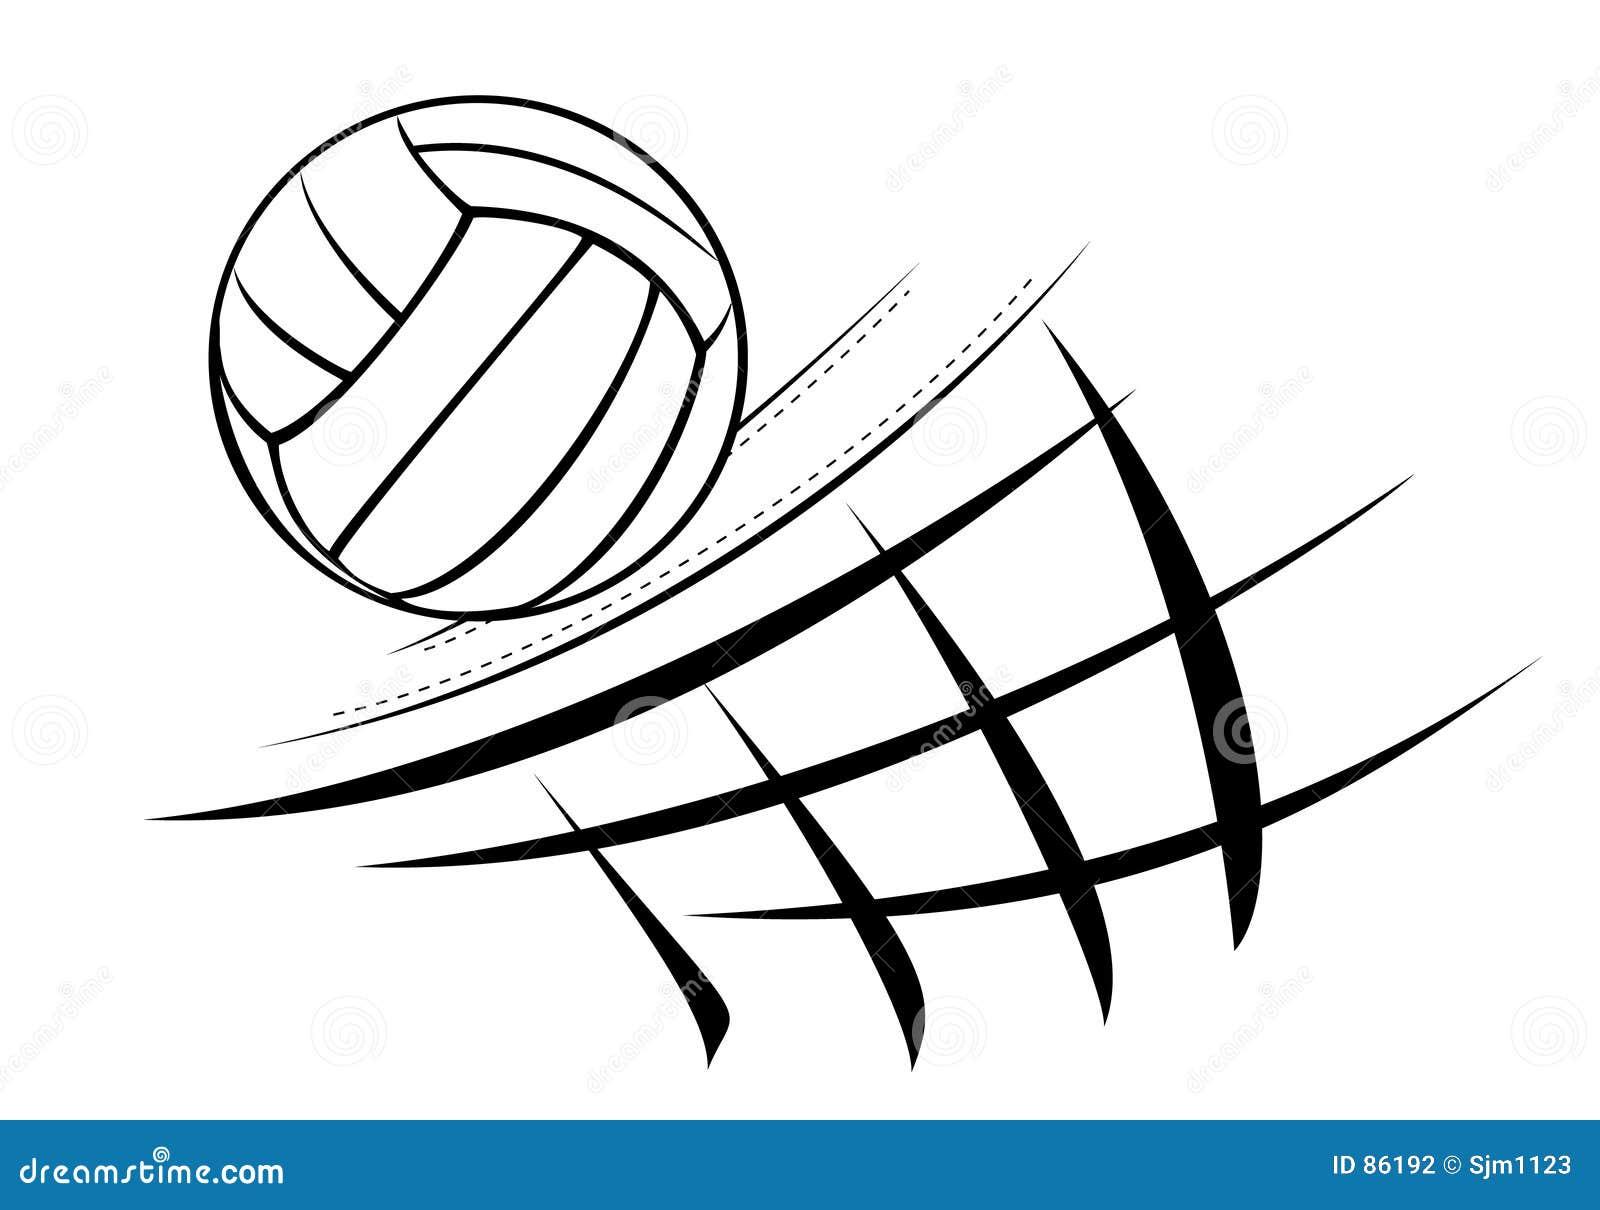 Stock Illustration Volleyball Tribal Abstract Vector: Ilustração Do Voleibol Ilustração Do Vetor. Ilustração De